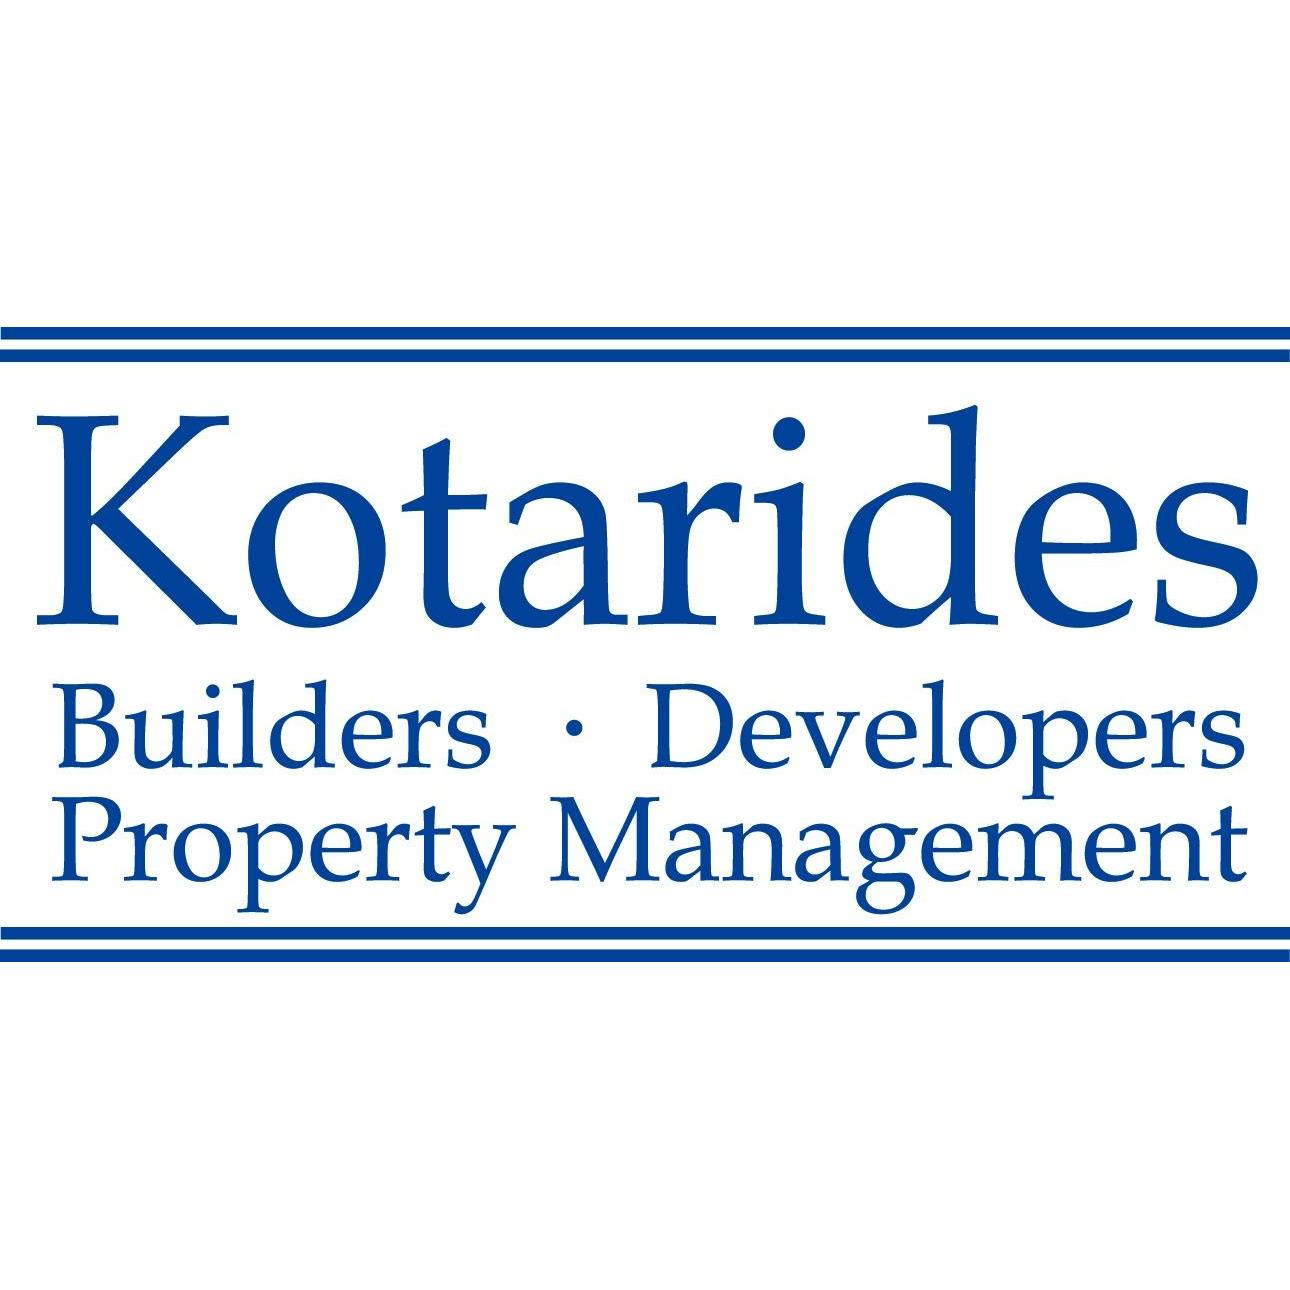 Kotarides Companies